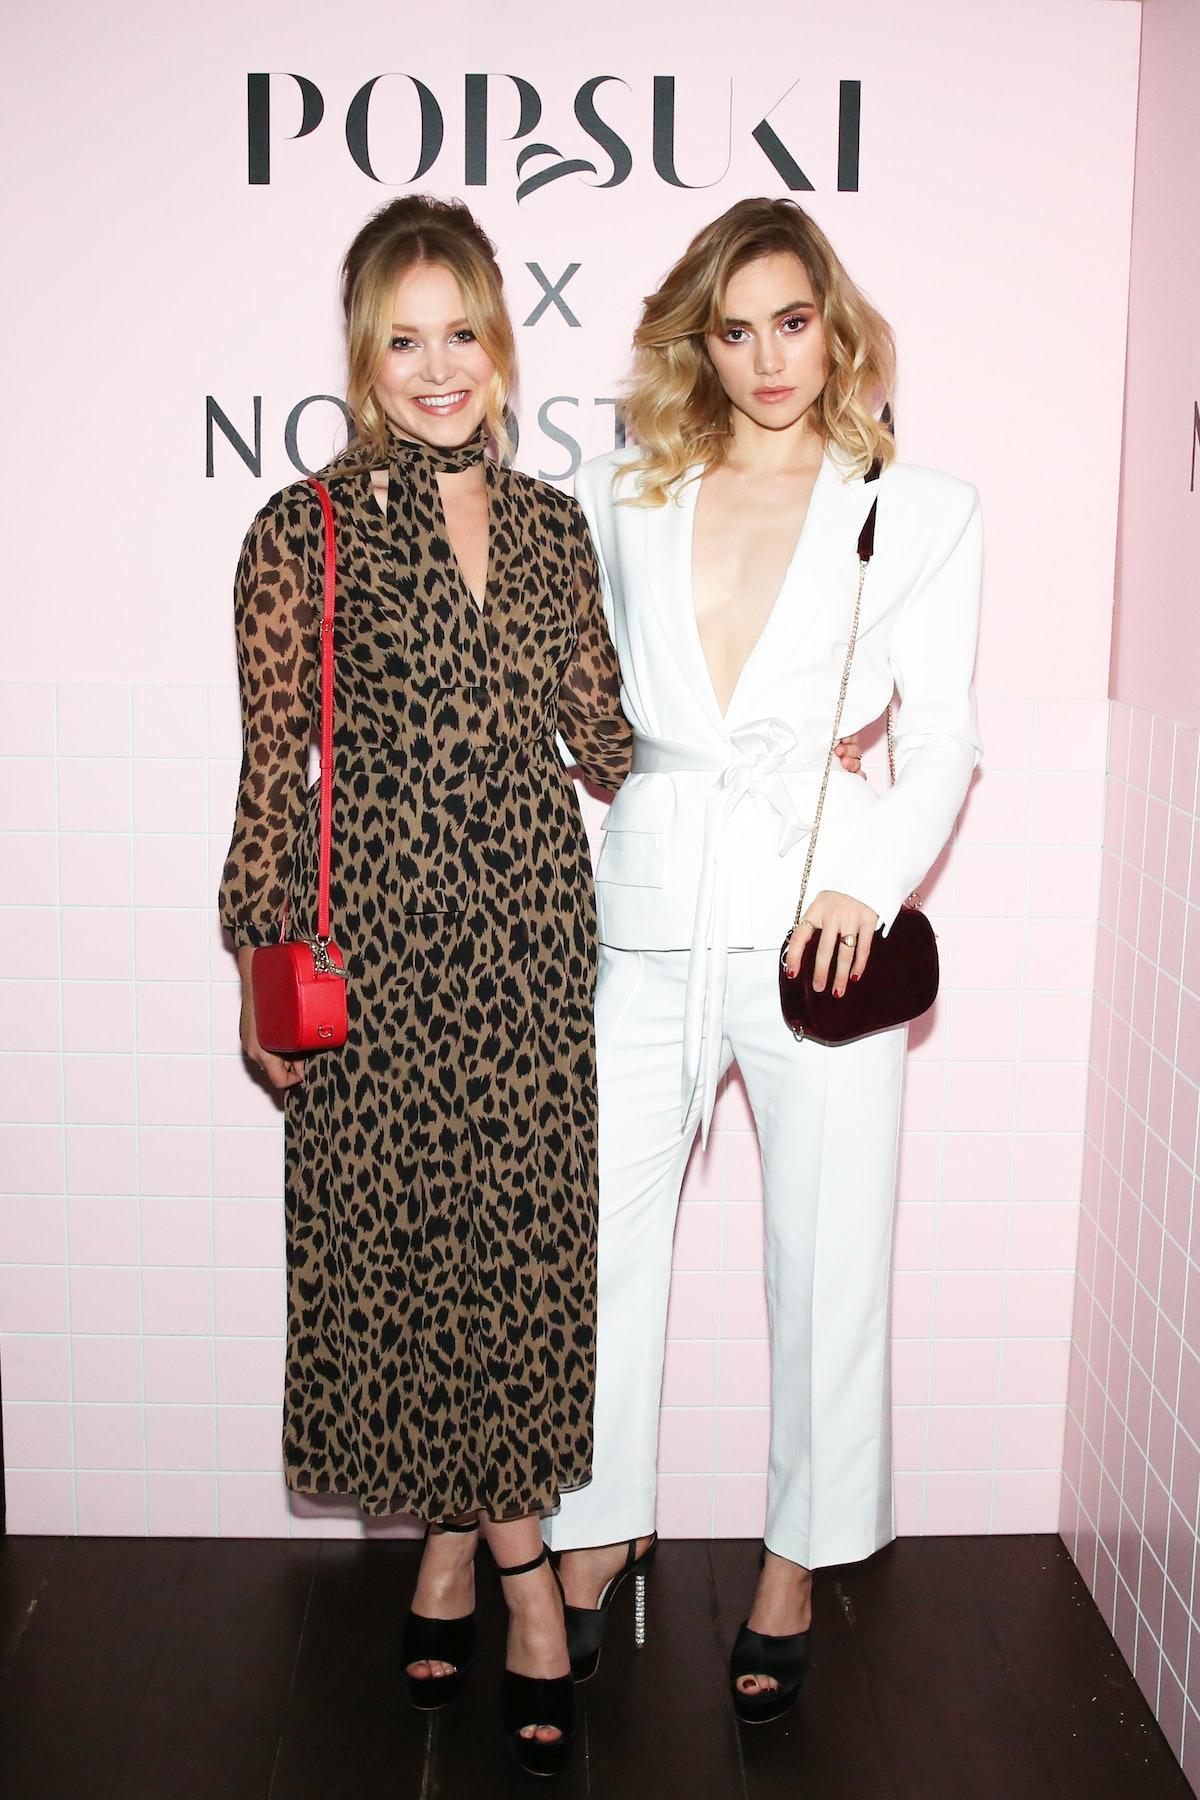 Pop & Suki X Nordstrom : Poppy Jamie and Suki Waterhouse Host An All-Girls Dinner To Celebrate Pop &...